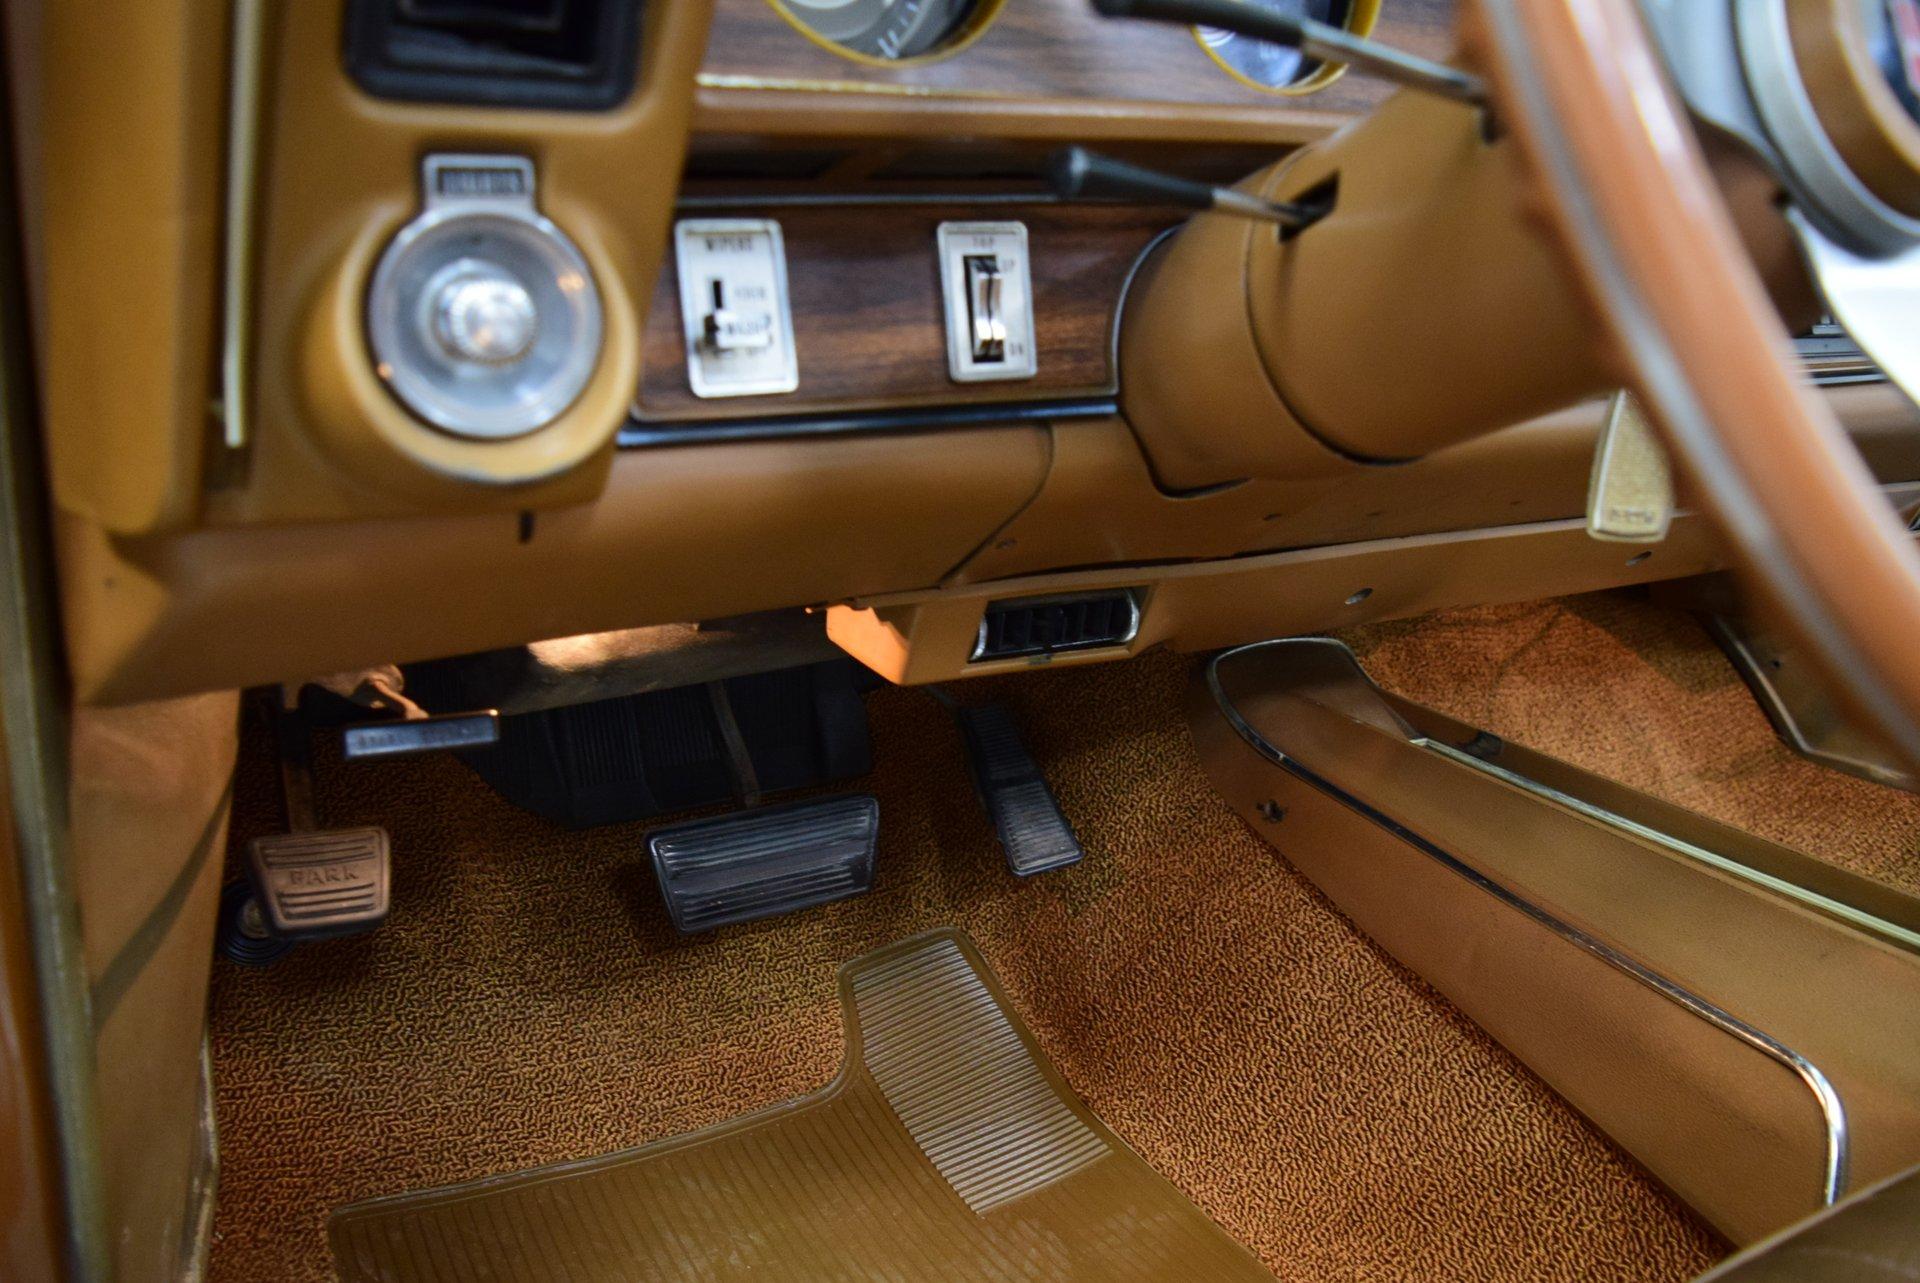 1972 Oldsmobile Cutlass | Shelton Classics & Performance